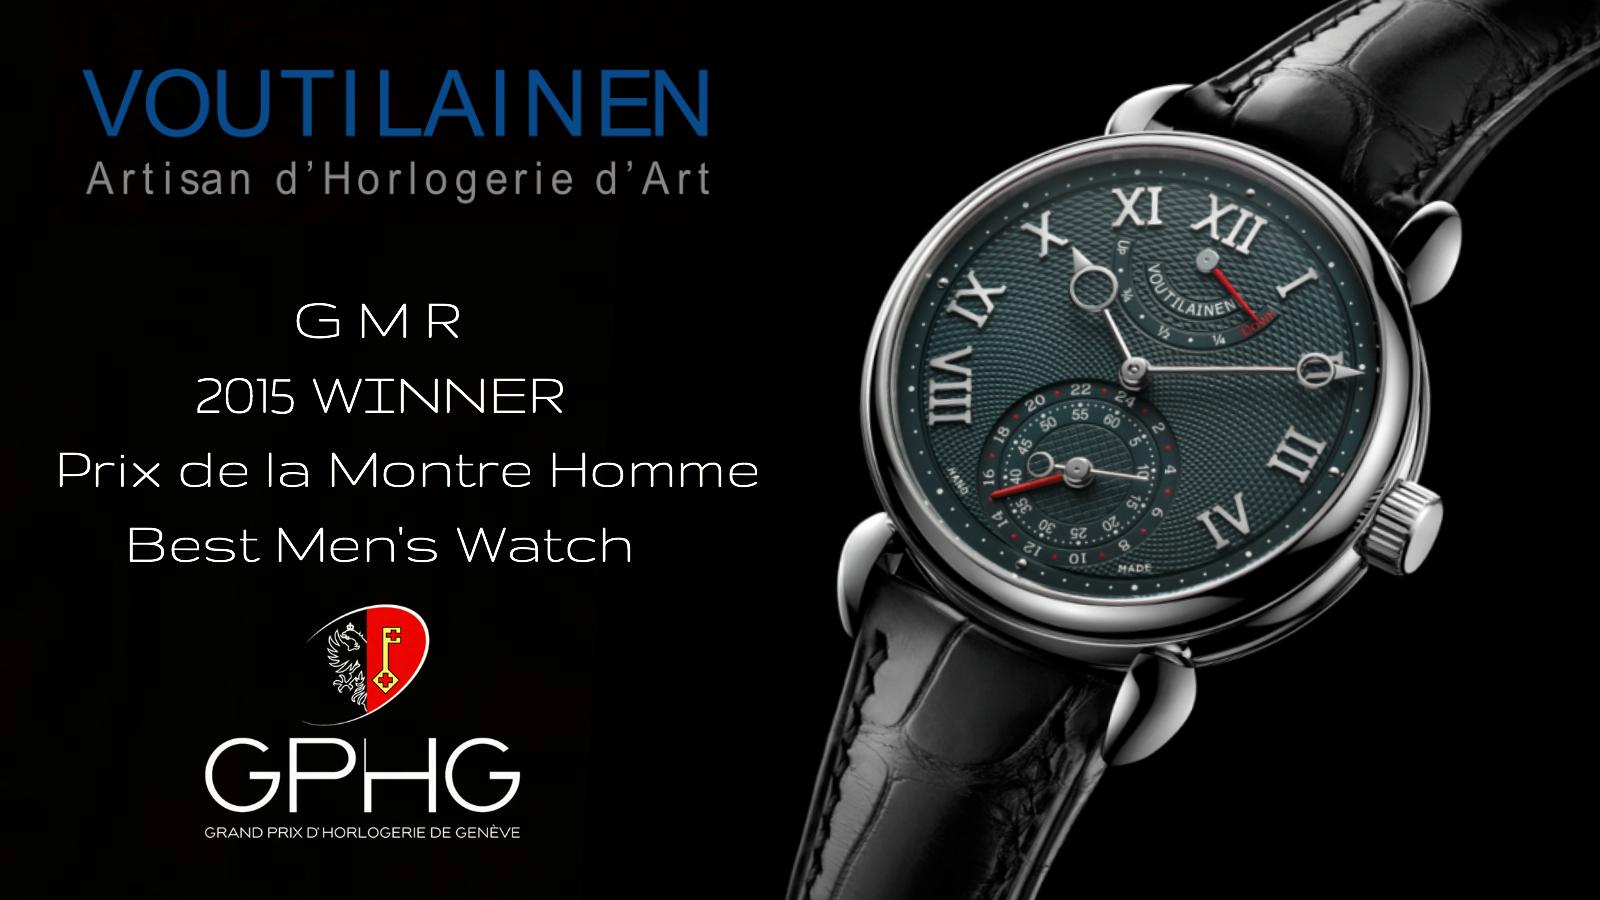 Kari Voutilainen GMR at Chronolux Fine Watches